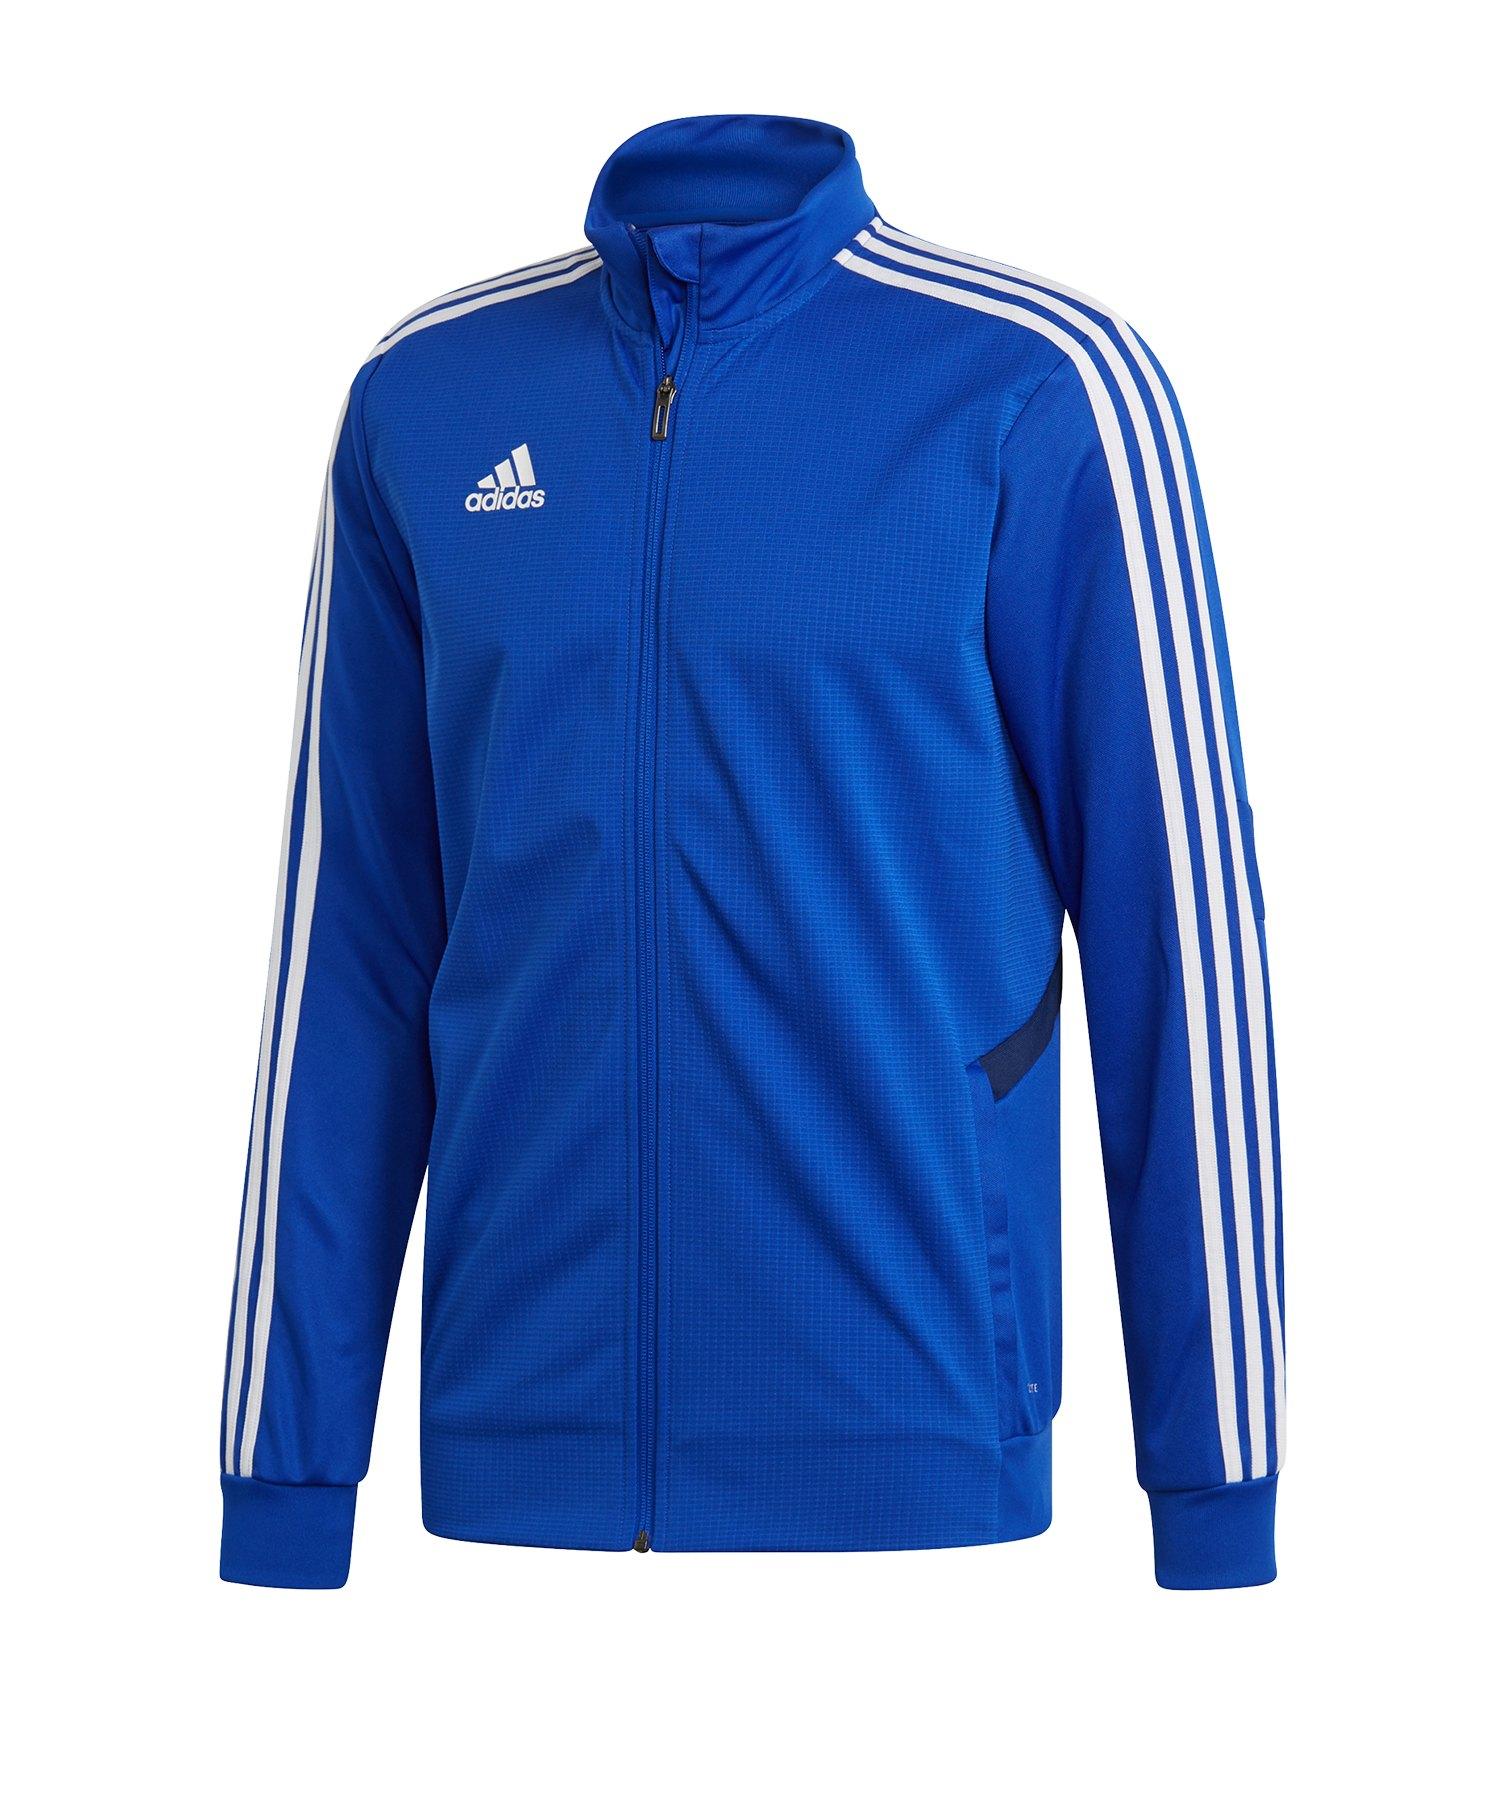 adidas Tiro 19 Trainingsjacke Blau Weiss - blau